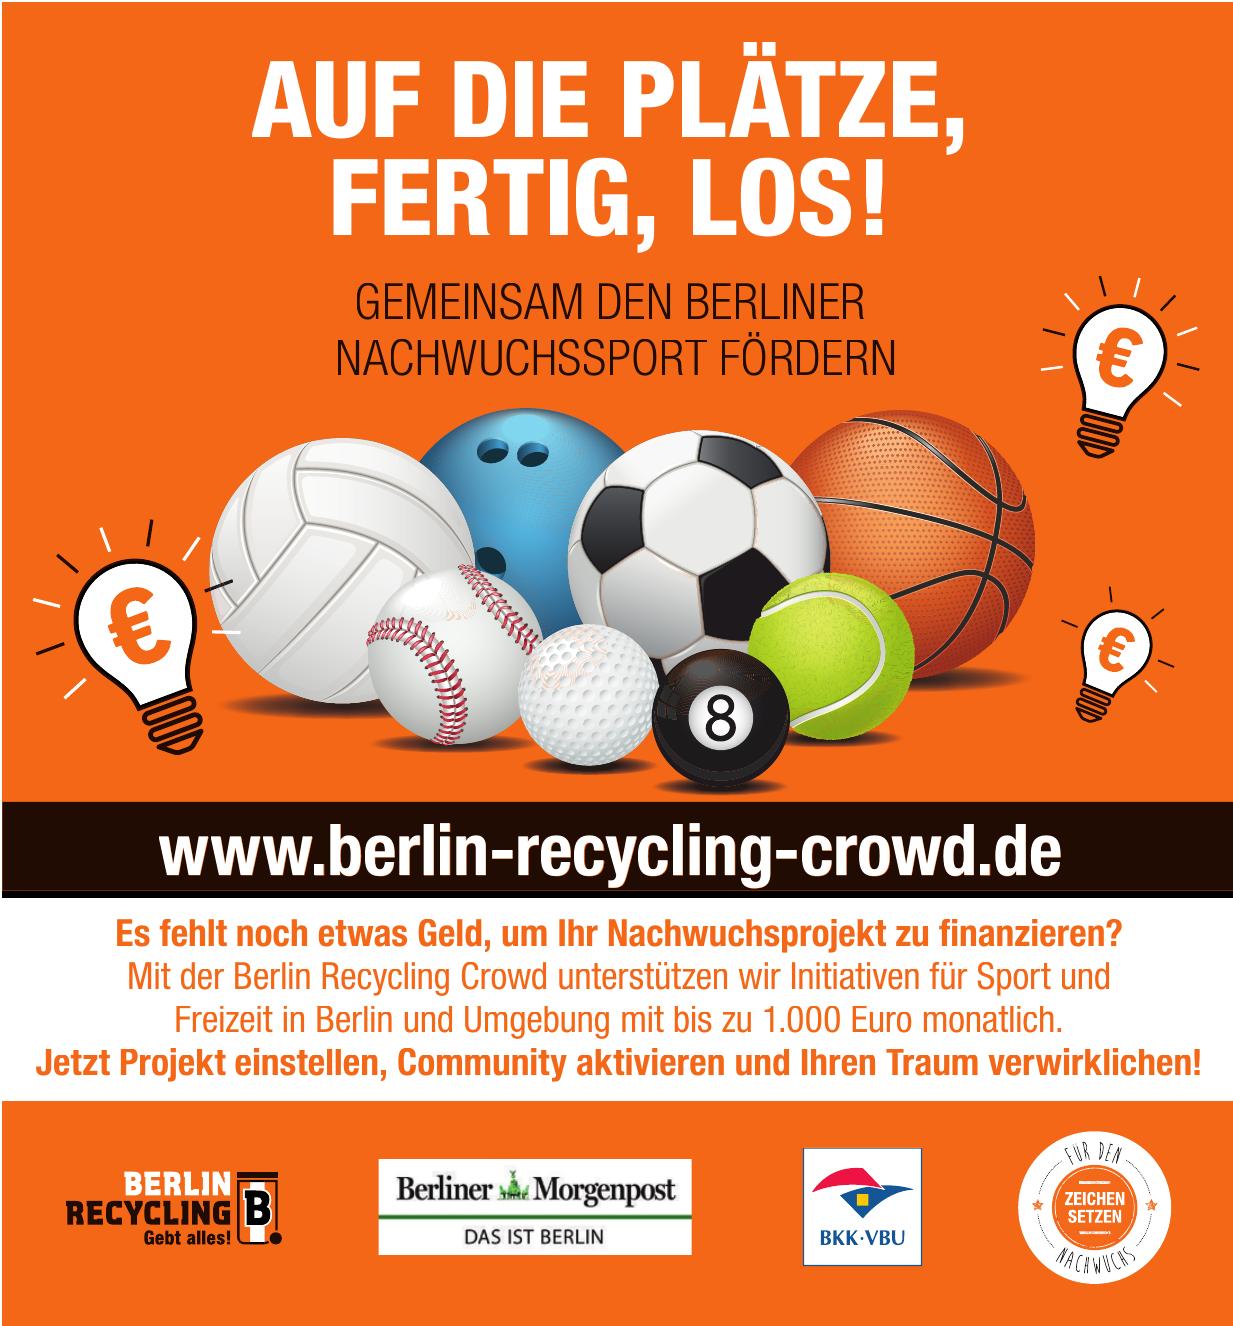 Berlin Recycling Crowd